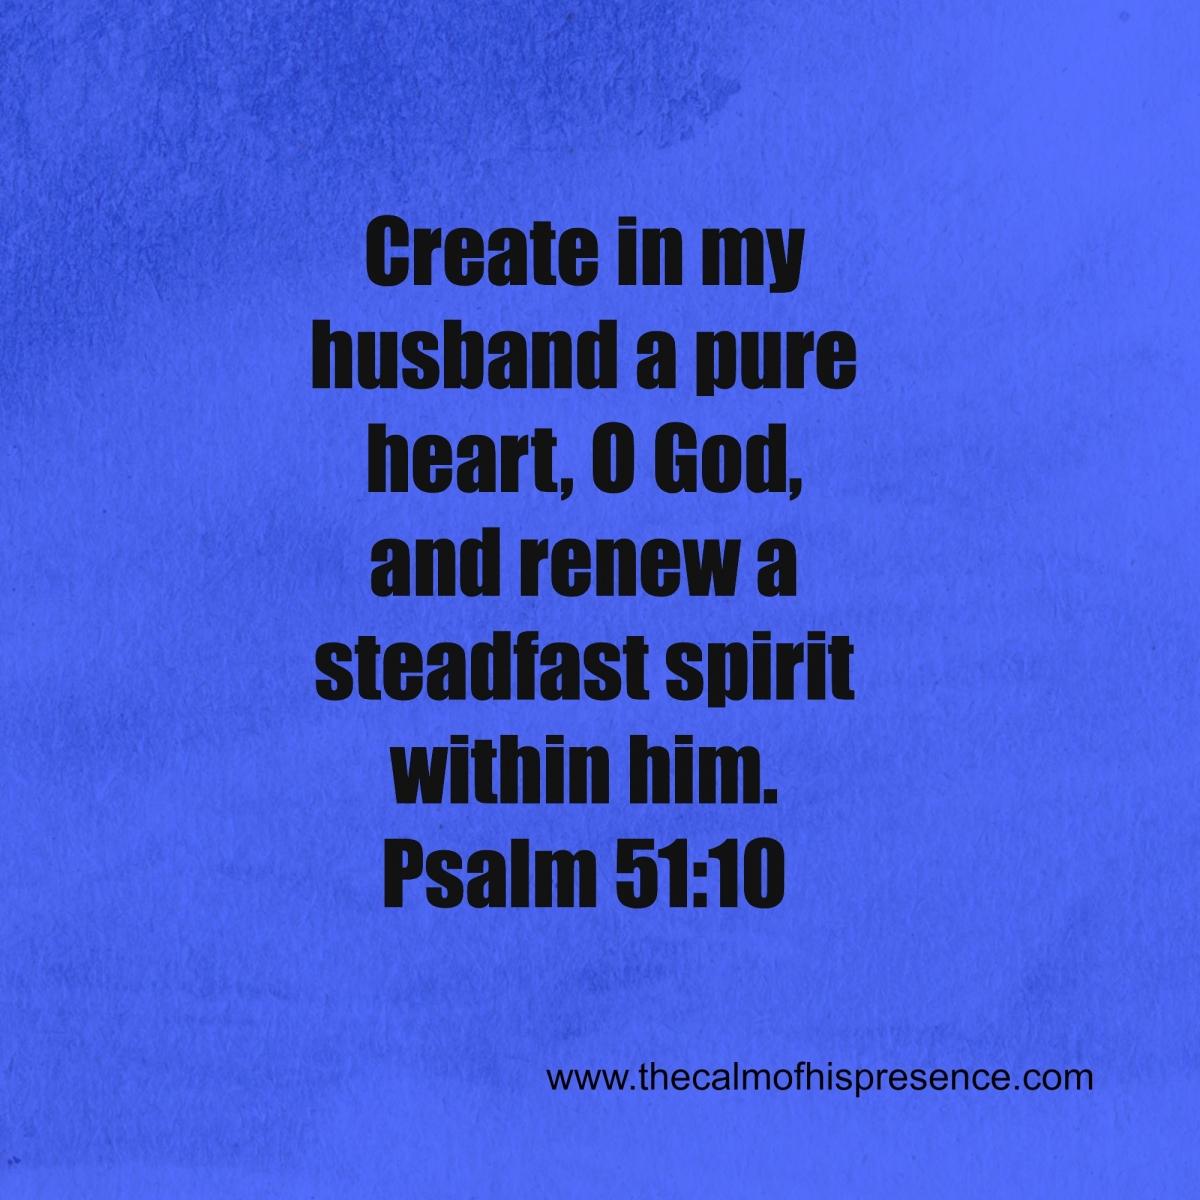 Success prayer for my husband